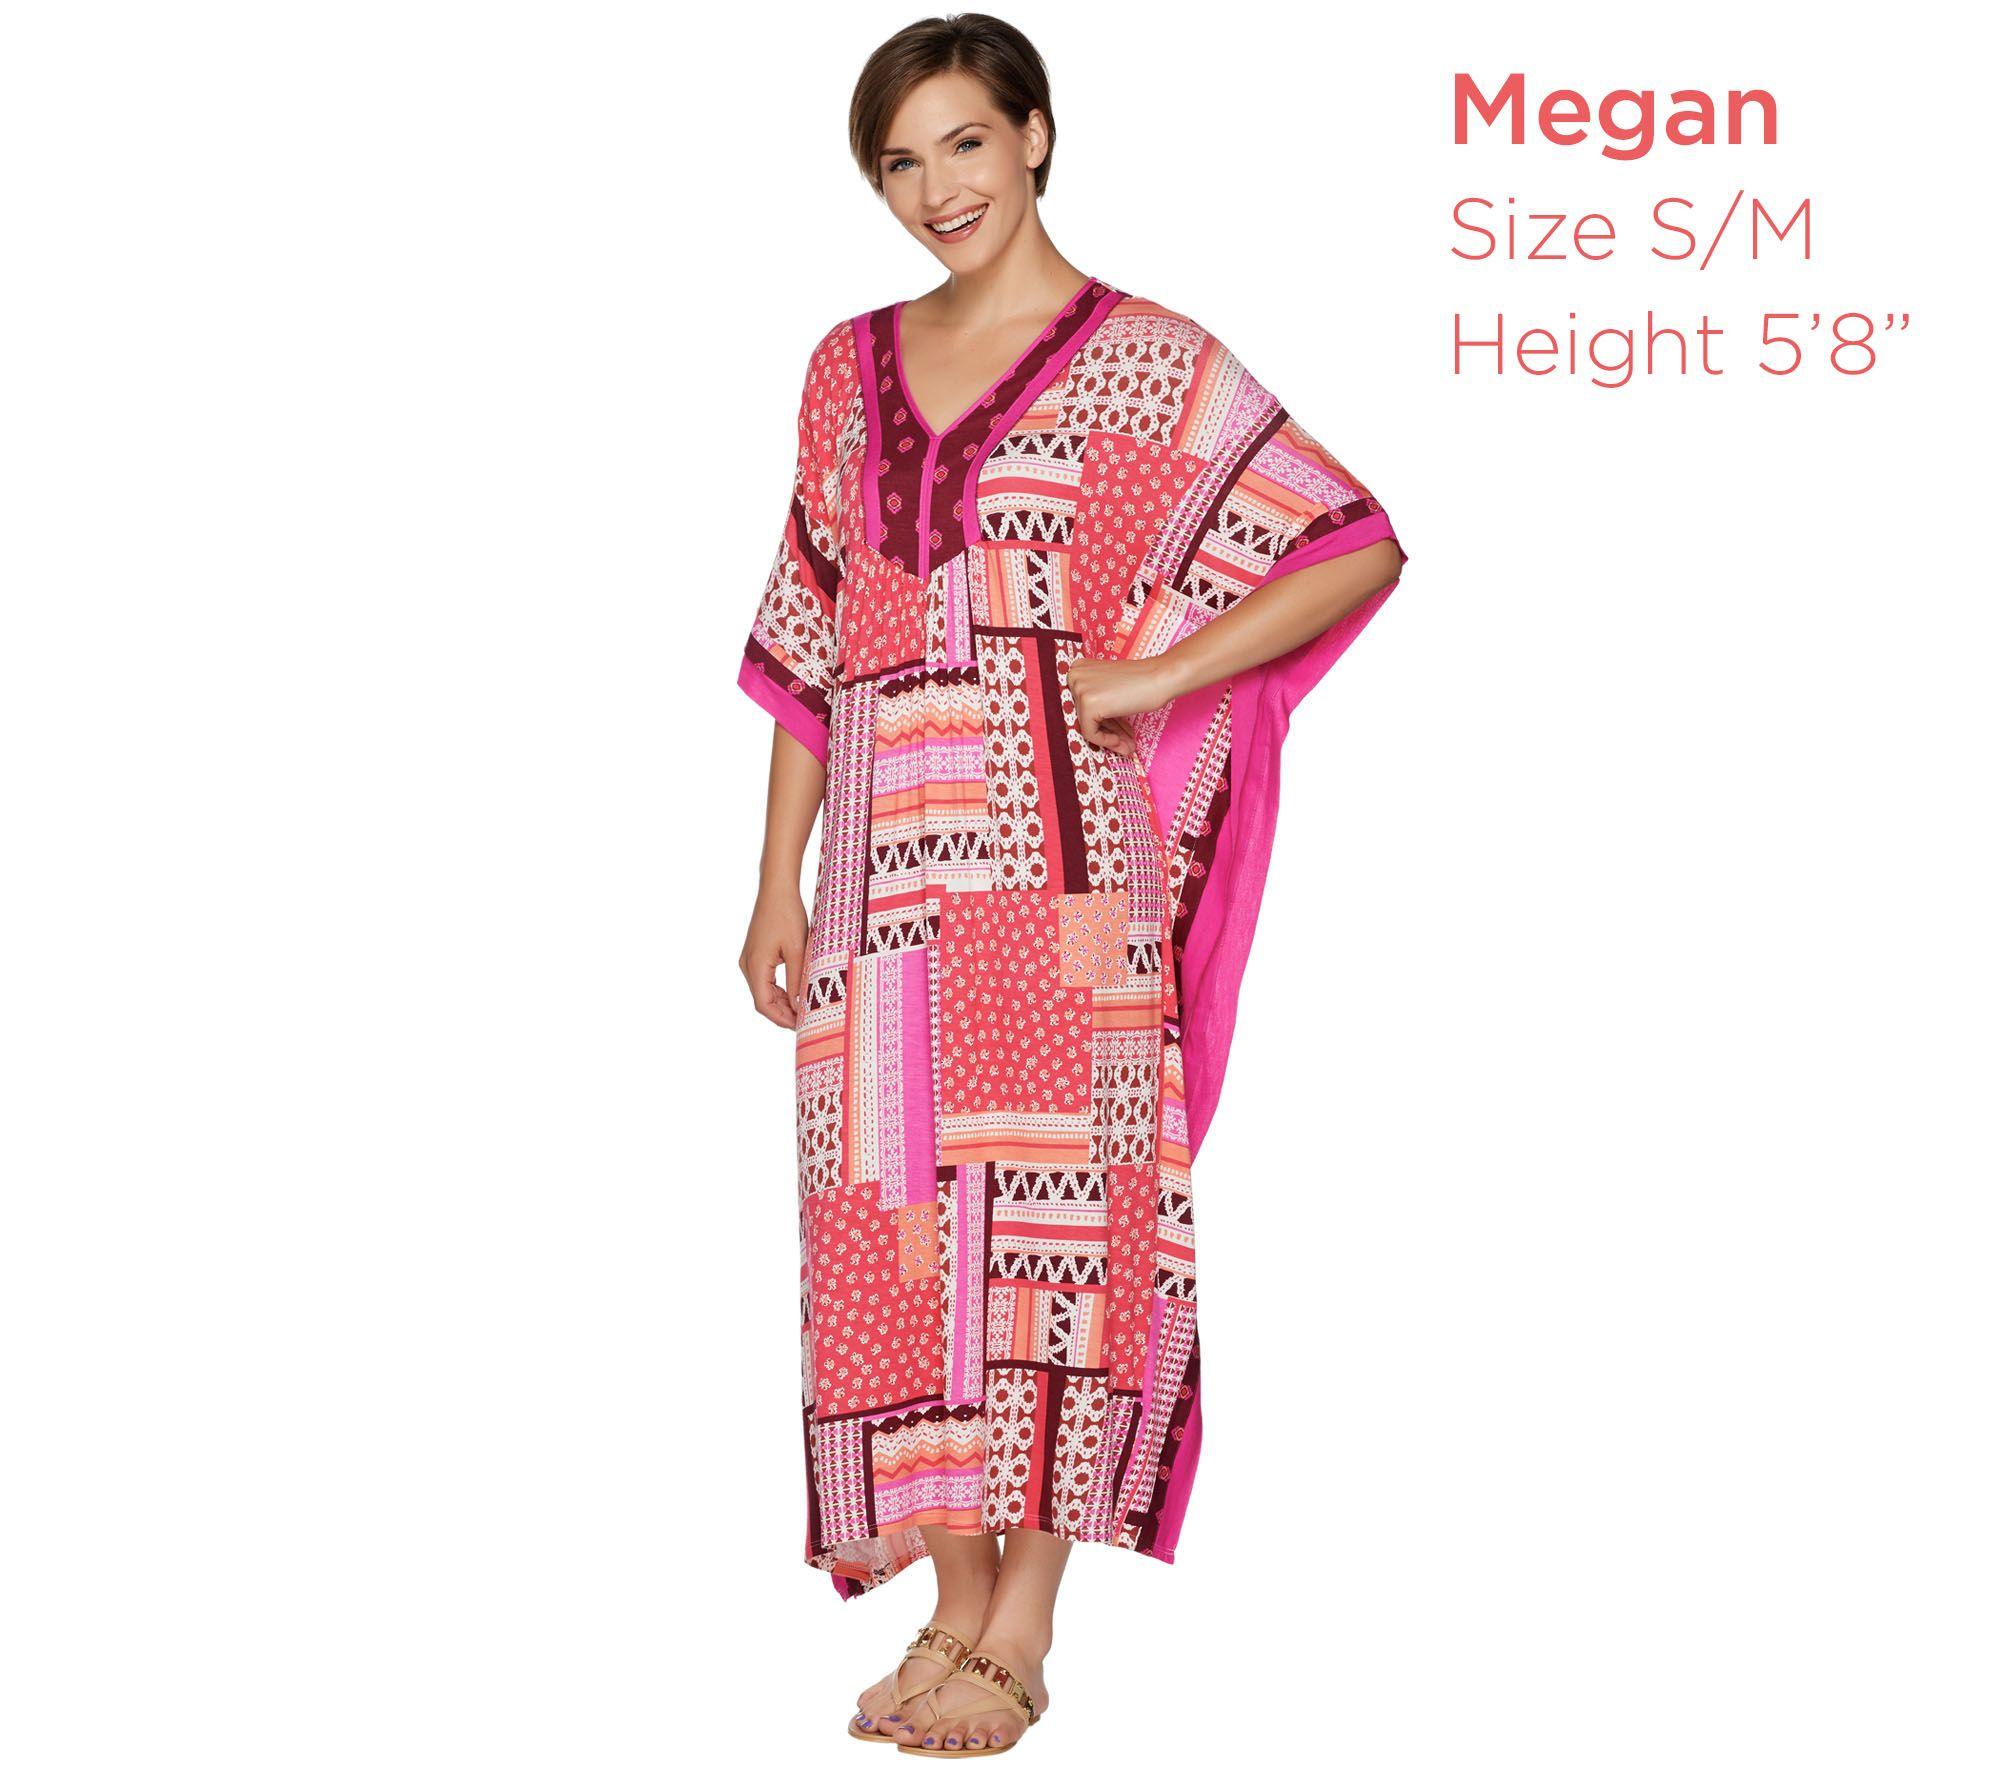 afbec9fb214 Ellen Tracy Jersey Knit V-Neck Long Caftan - Page 1 — QVC.com